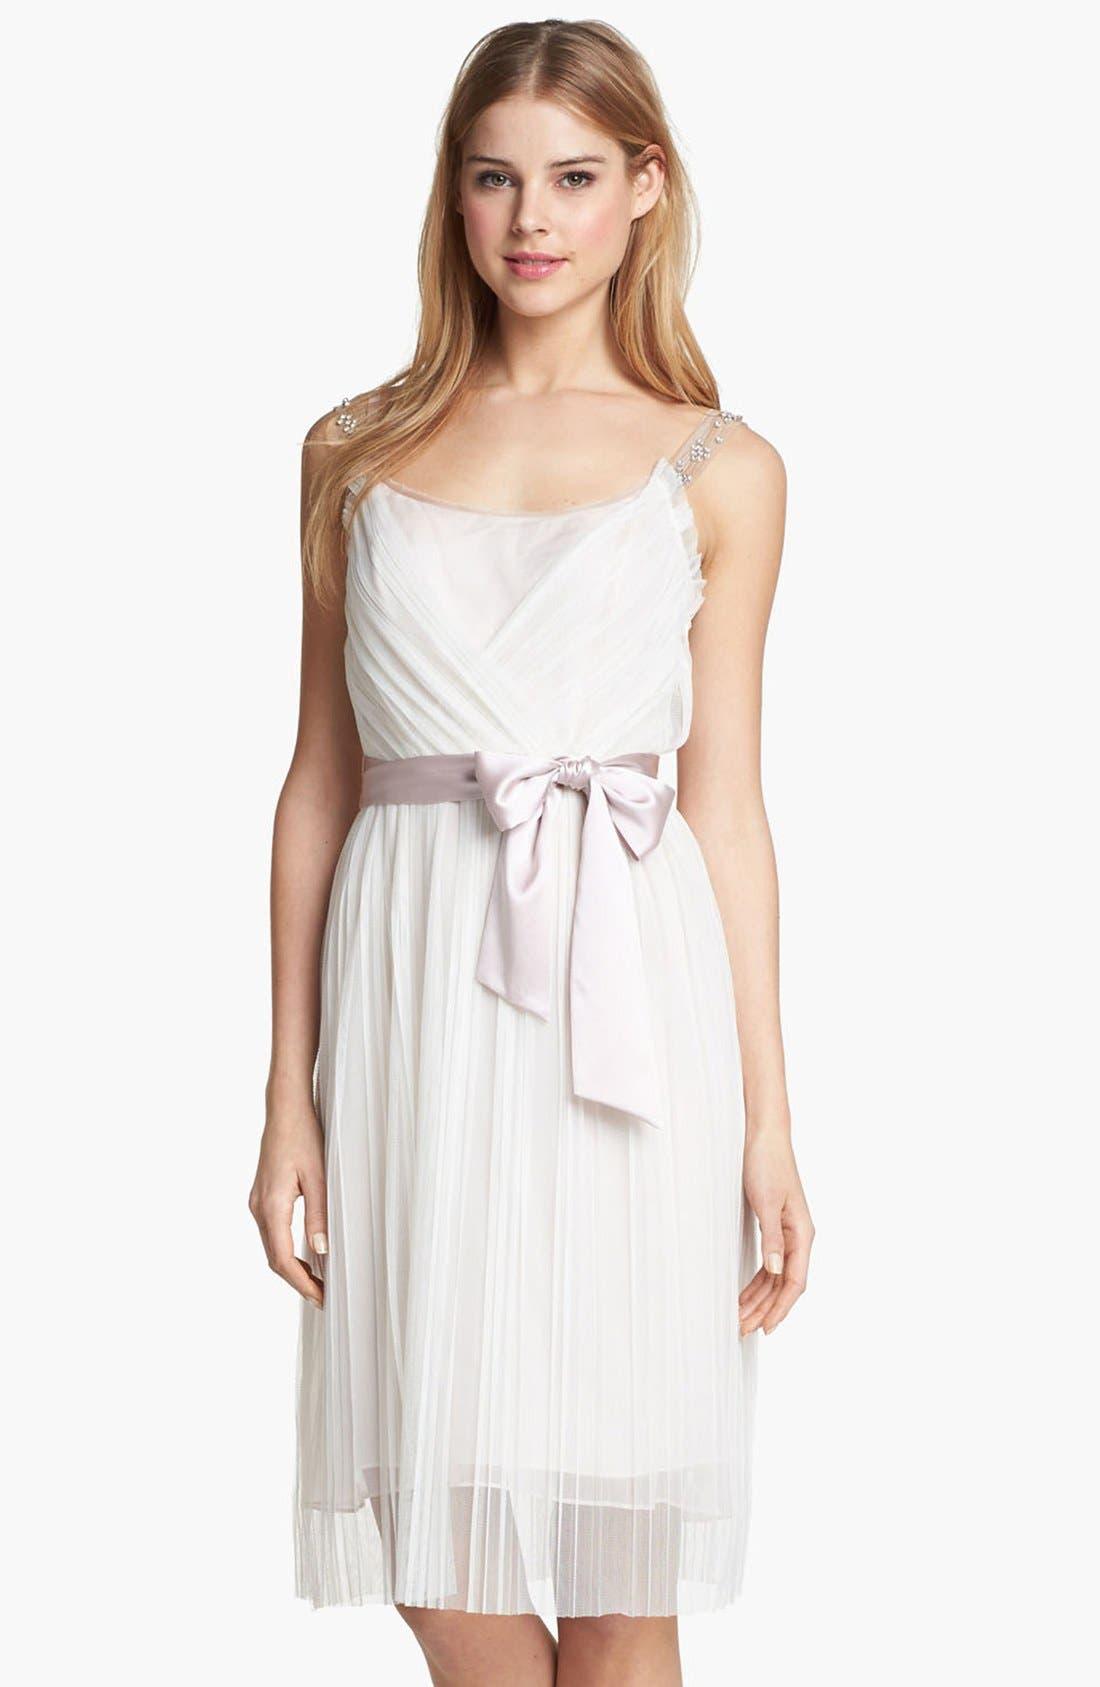 Alternate Image 1 Selected - Ivy & Blu Embellished Pleat Chiffon Dress (Online Only)